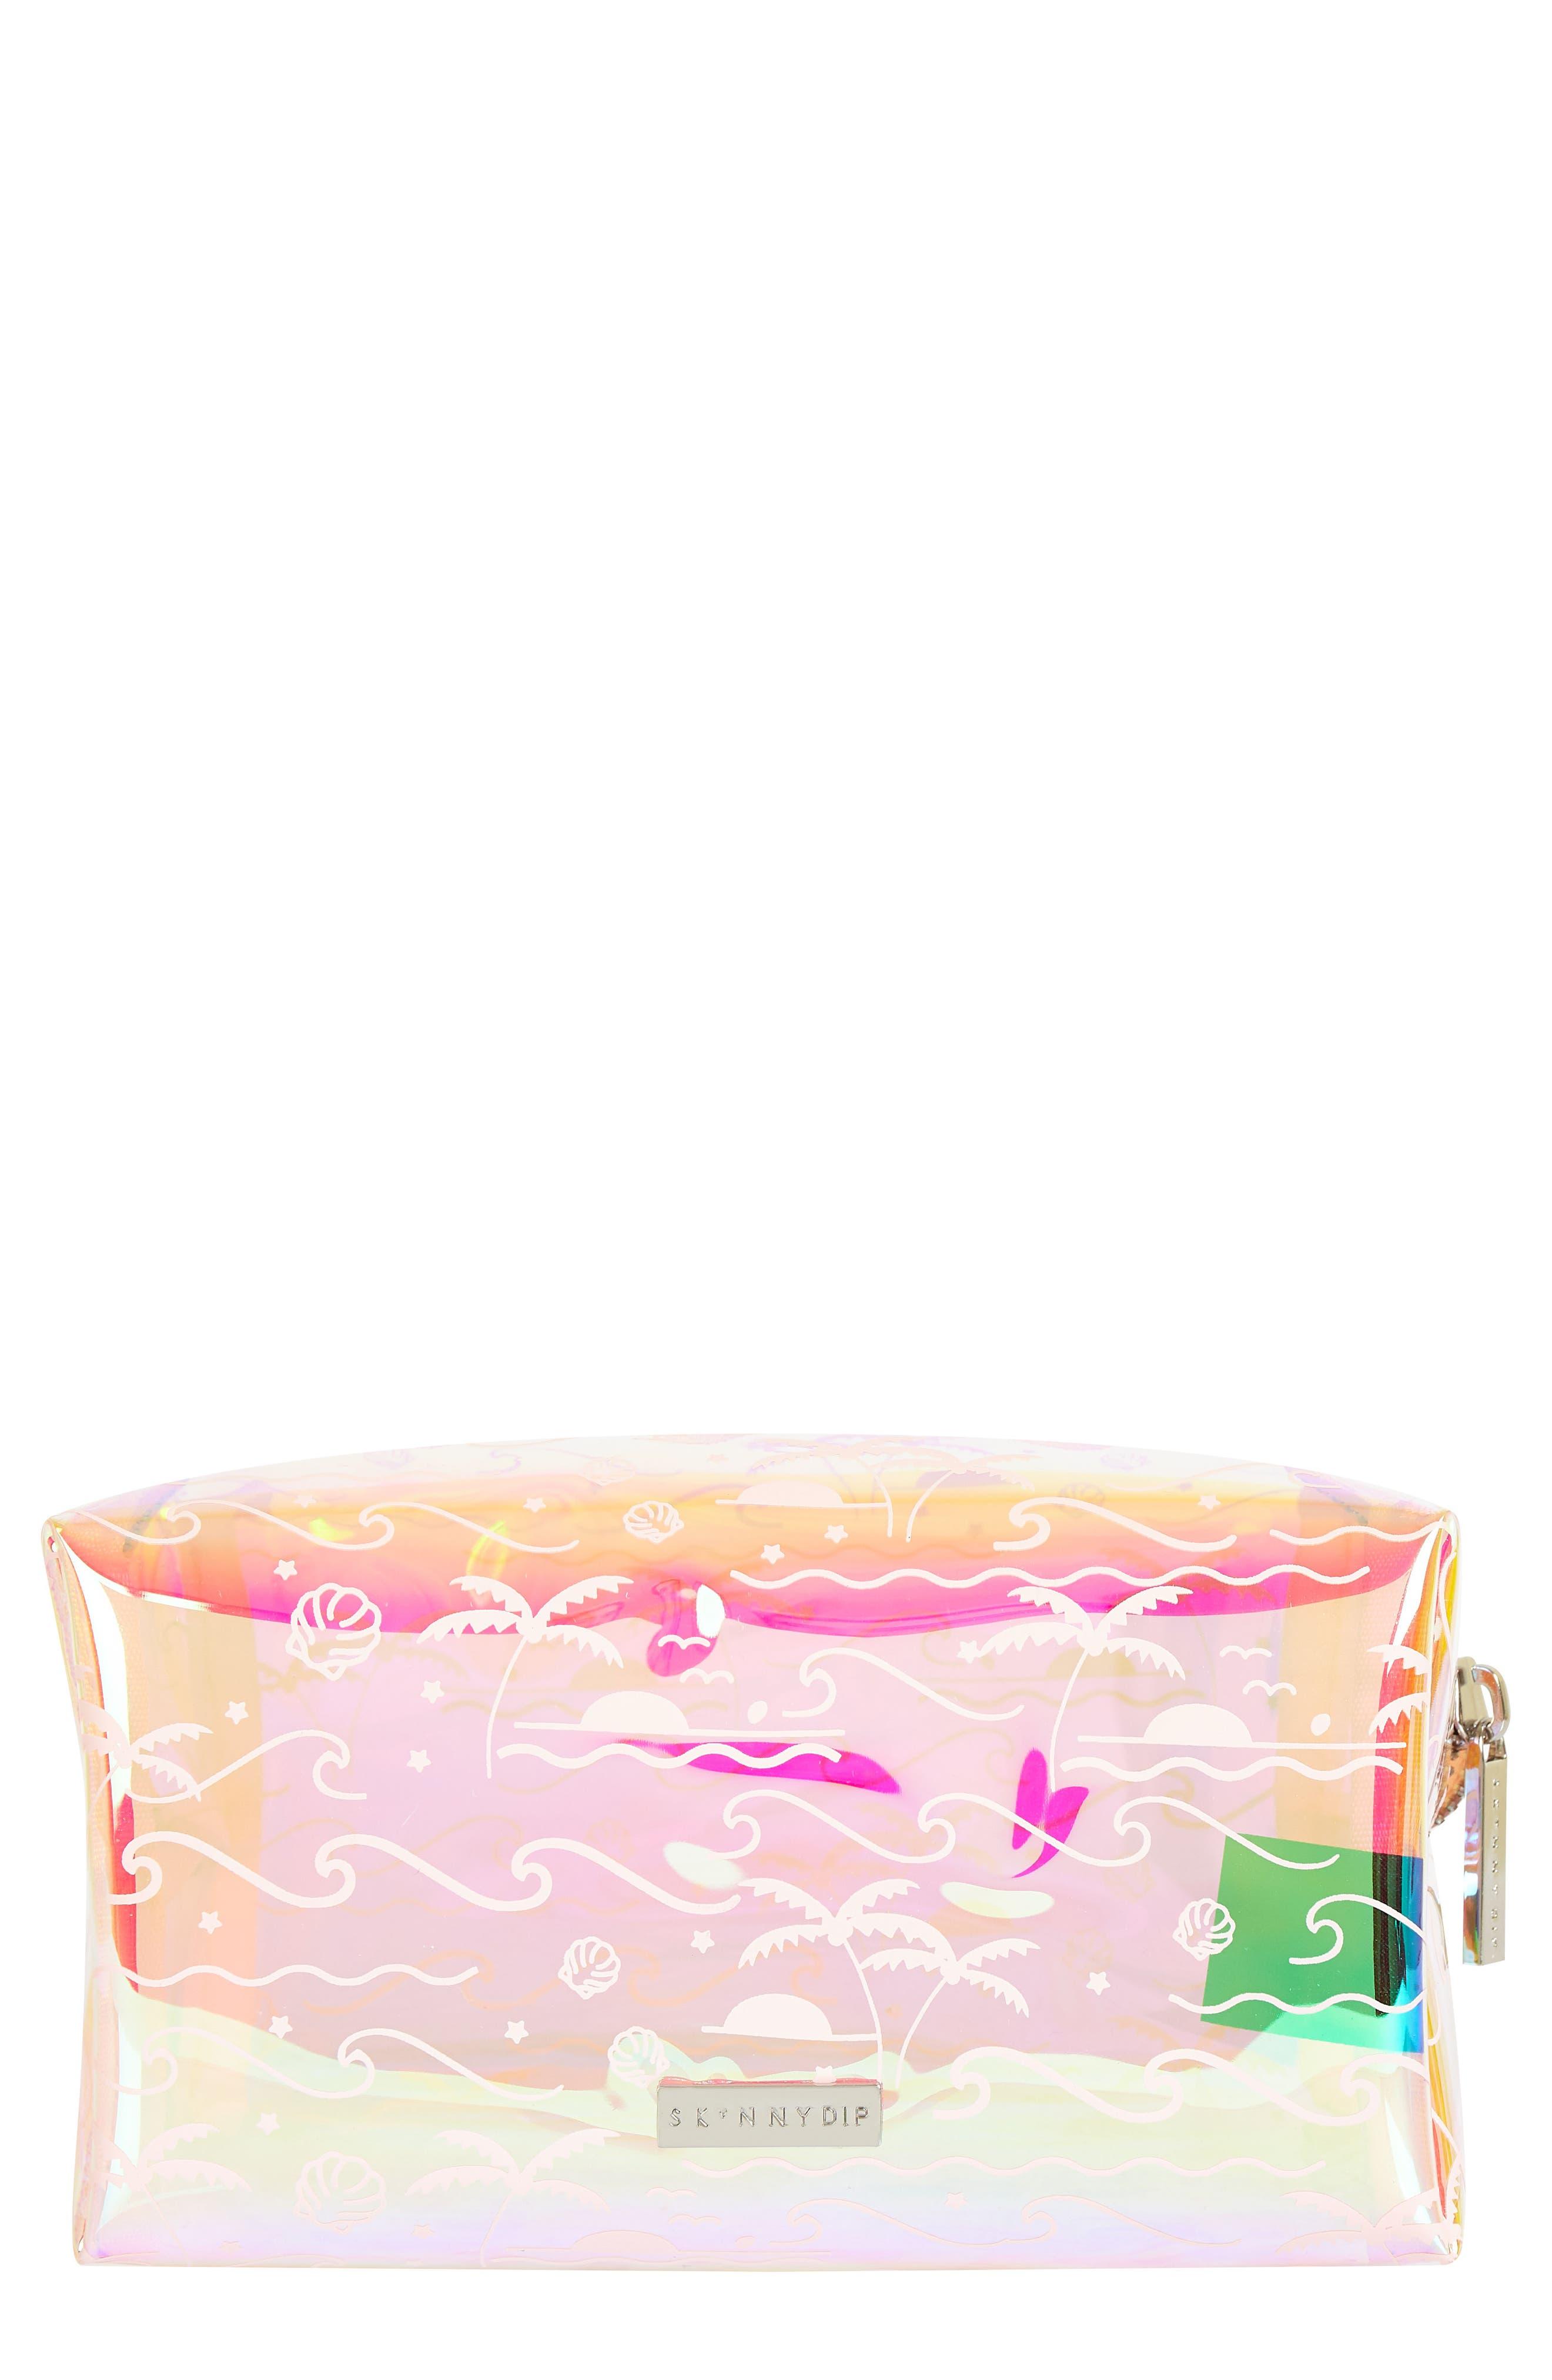 Skinny Dip Ocean Breeze Makeup Bag,                             Main thumbnail 1, color,                             No Color